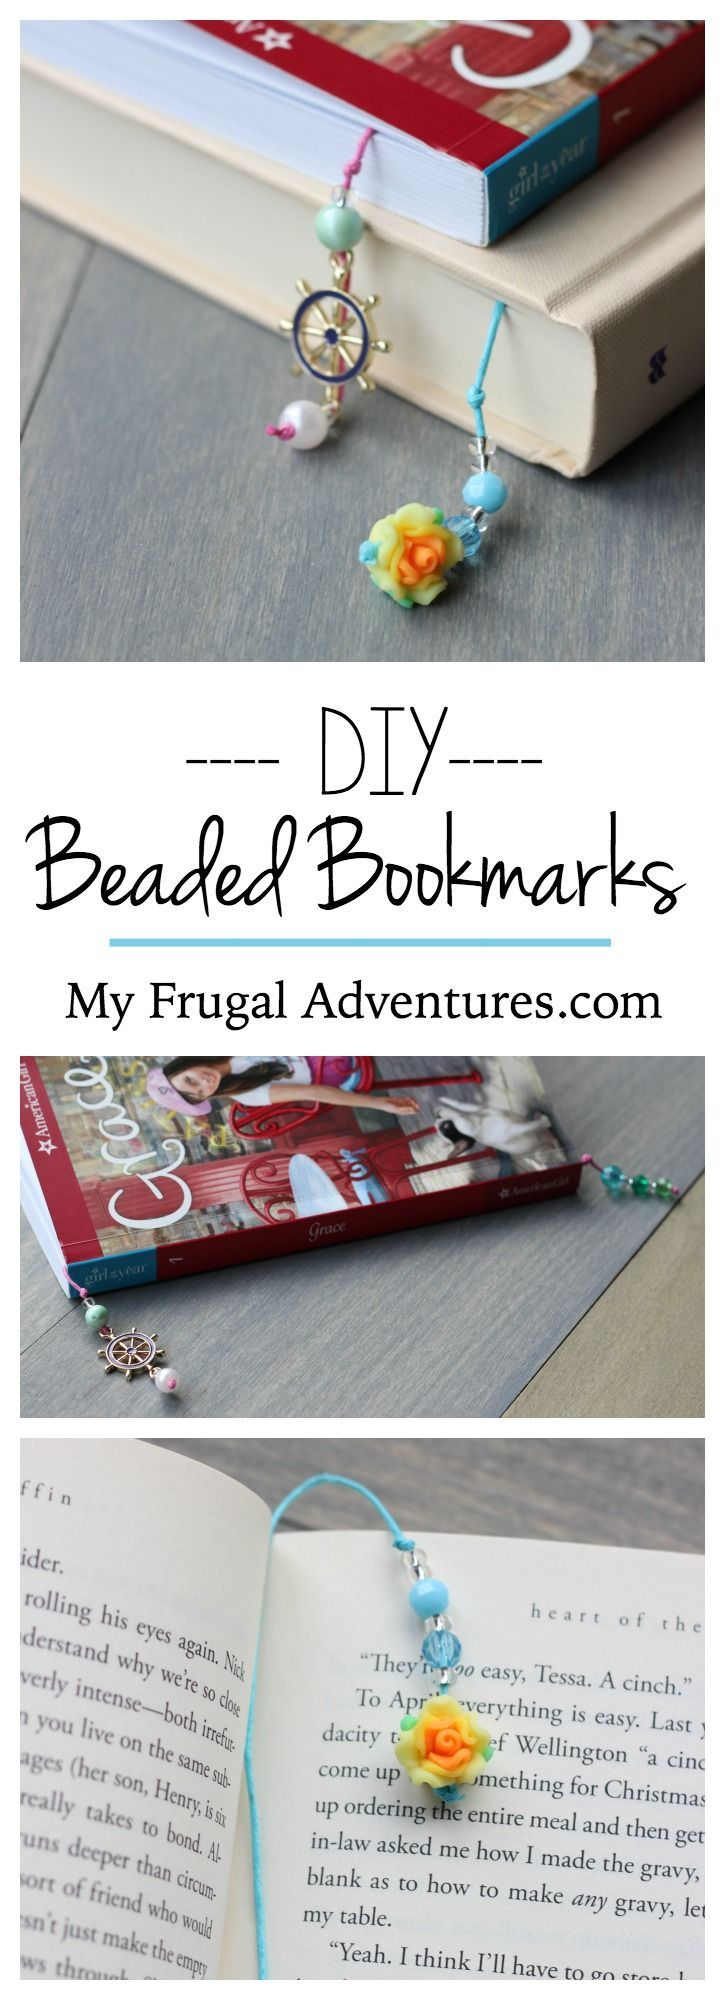 DIY Beaded Bookmarks Fun Childrenu0027s Craft 308